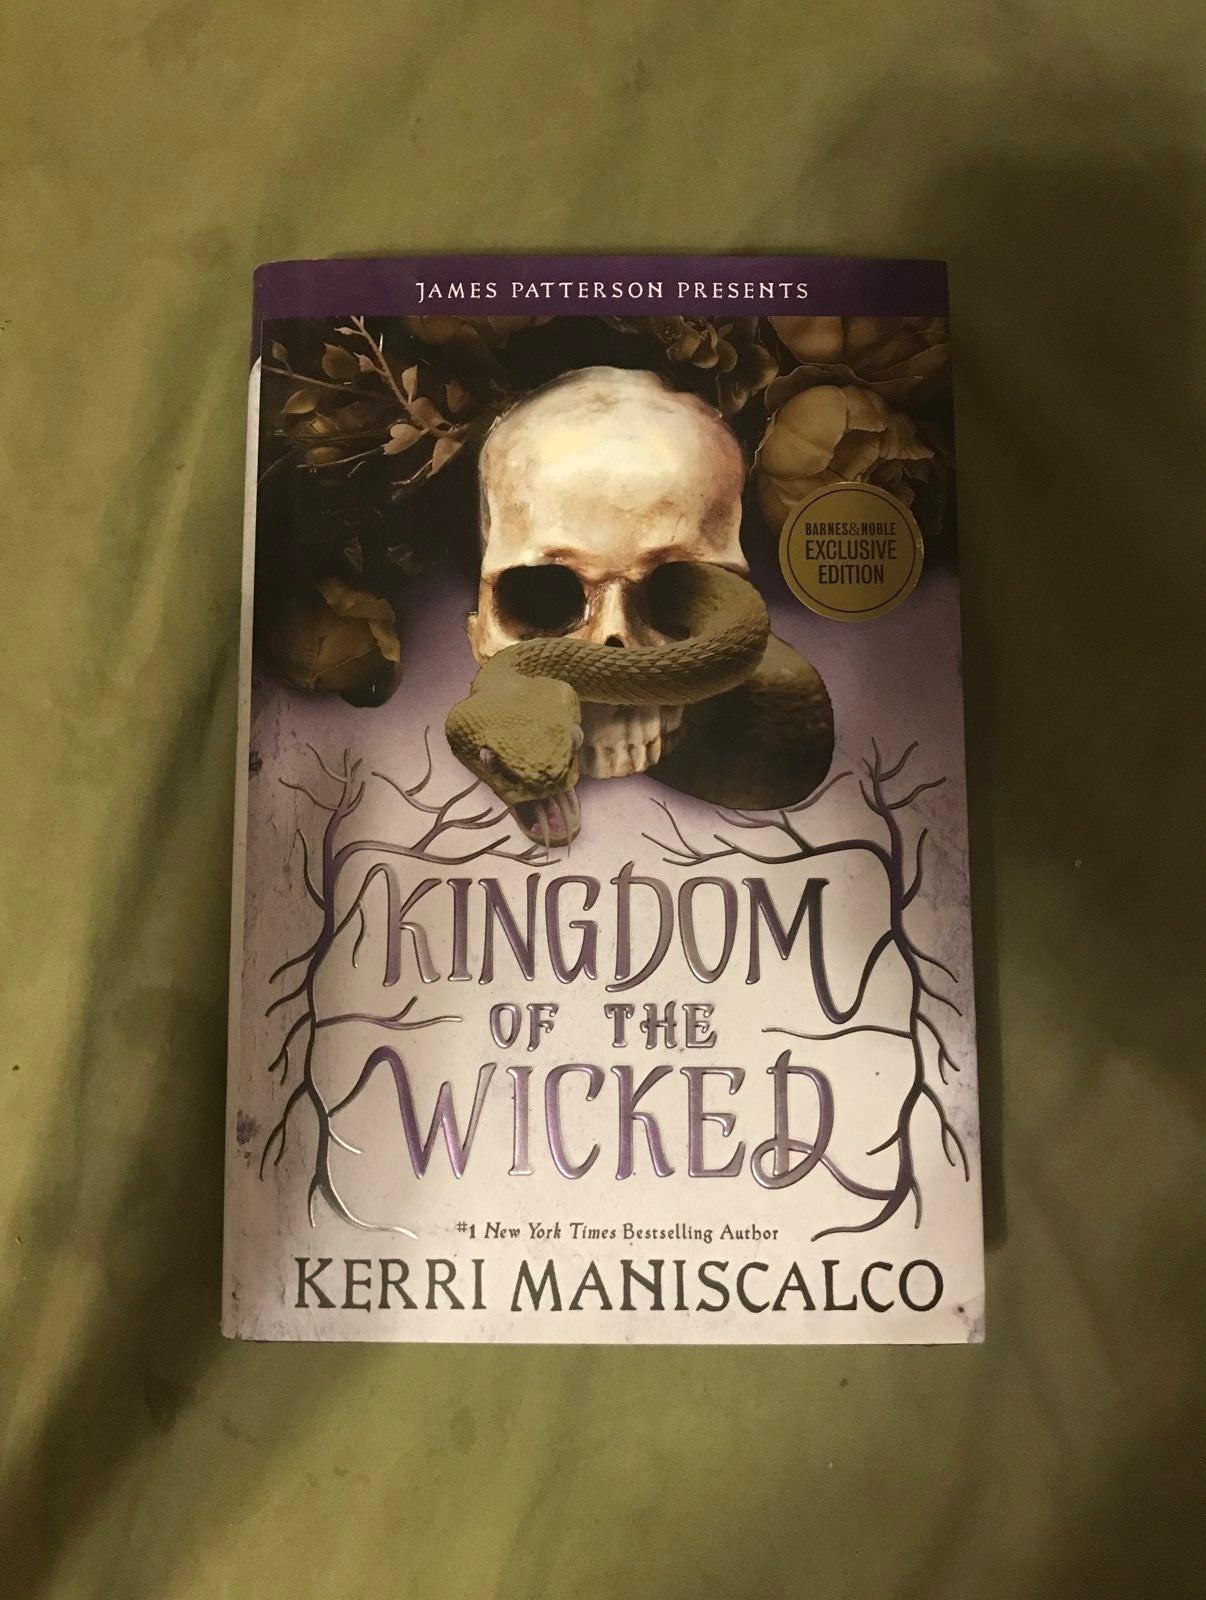 B&N Kingdom of the Wicked Maniscalco